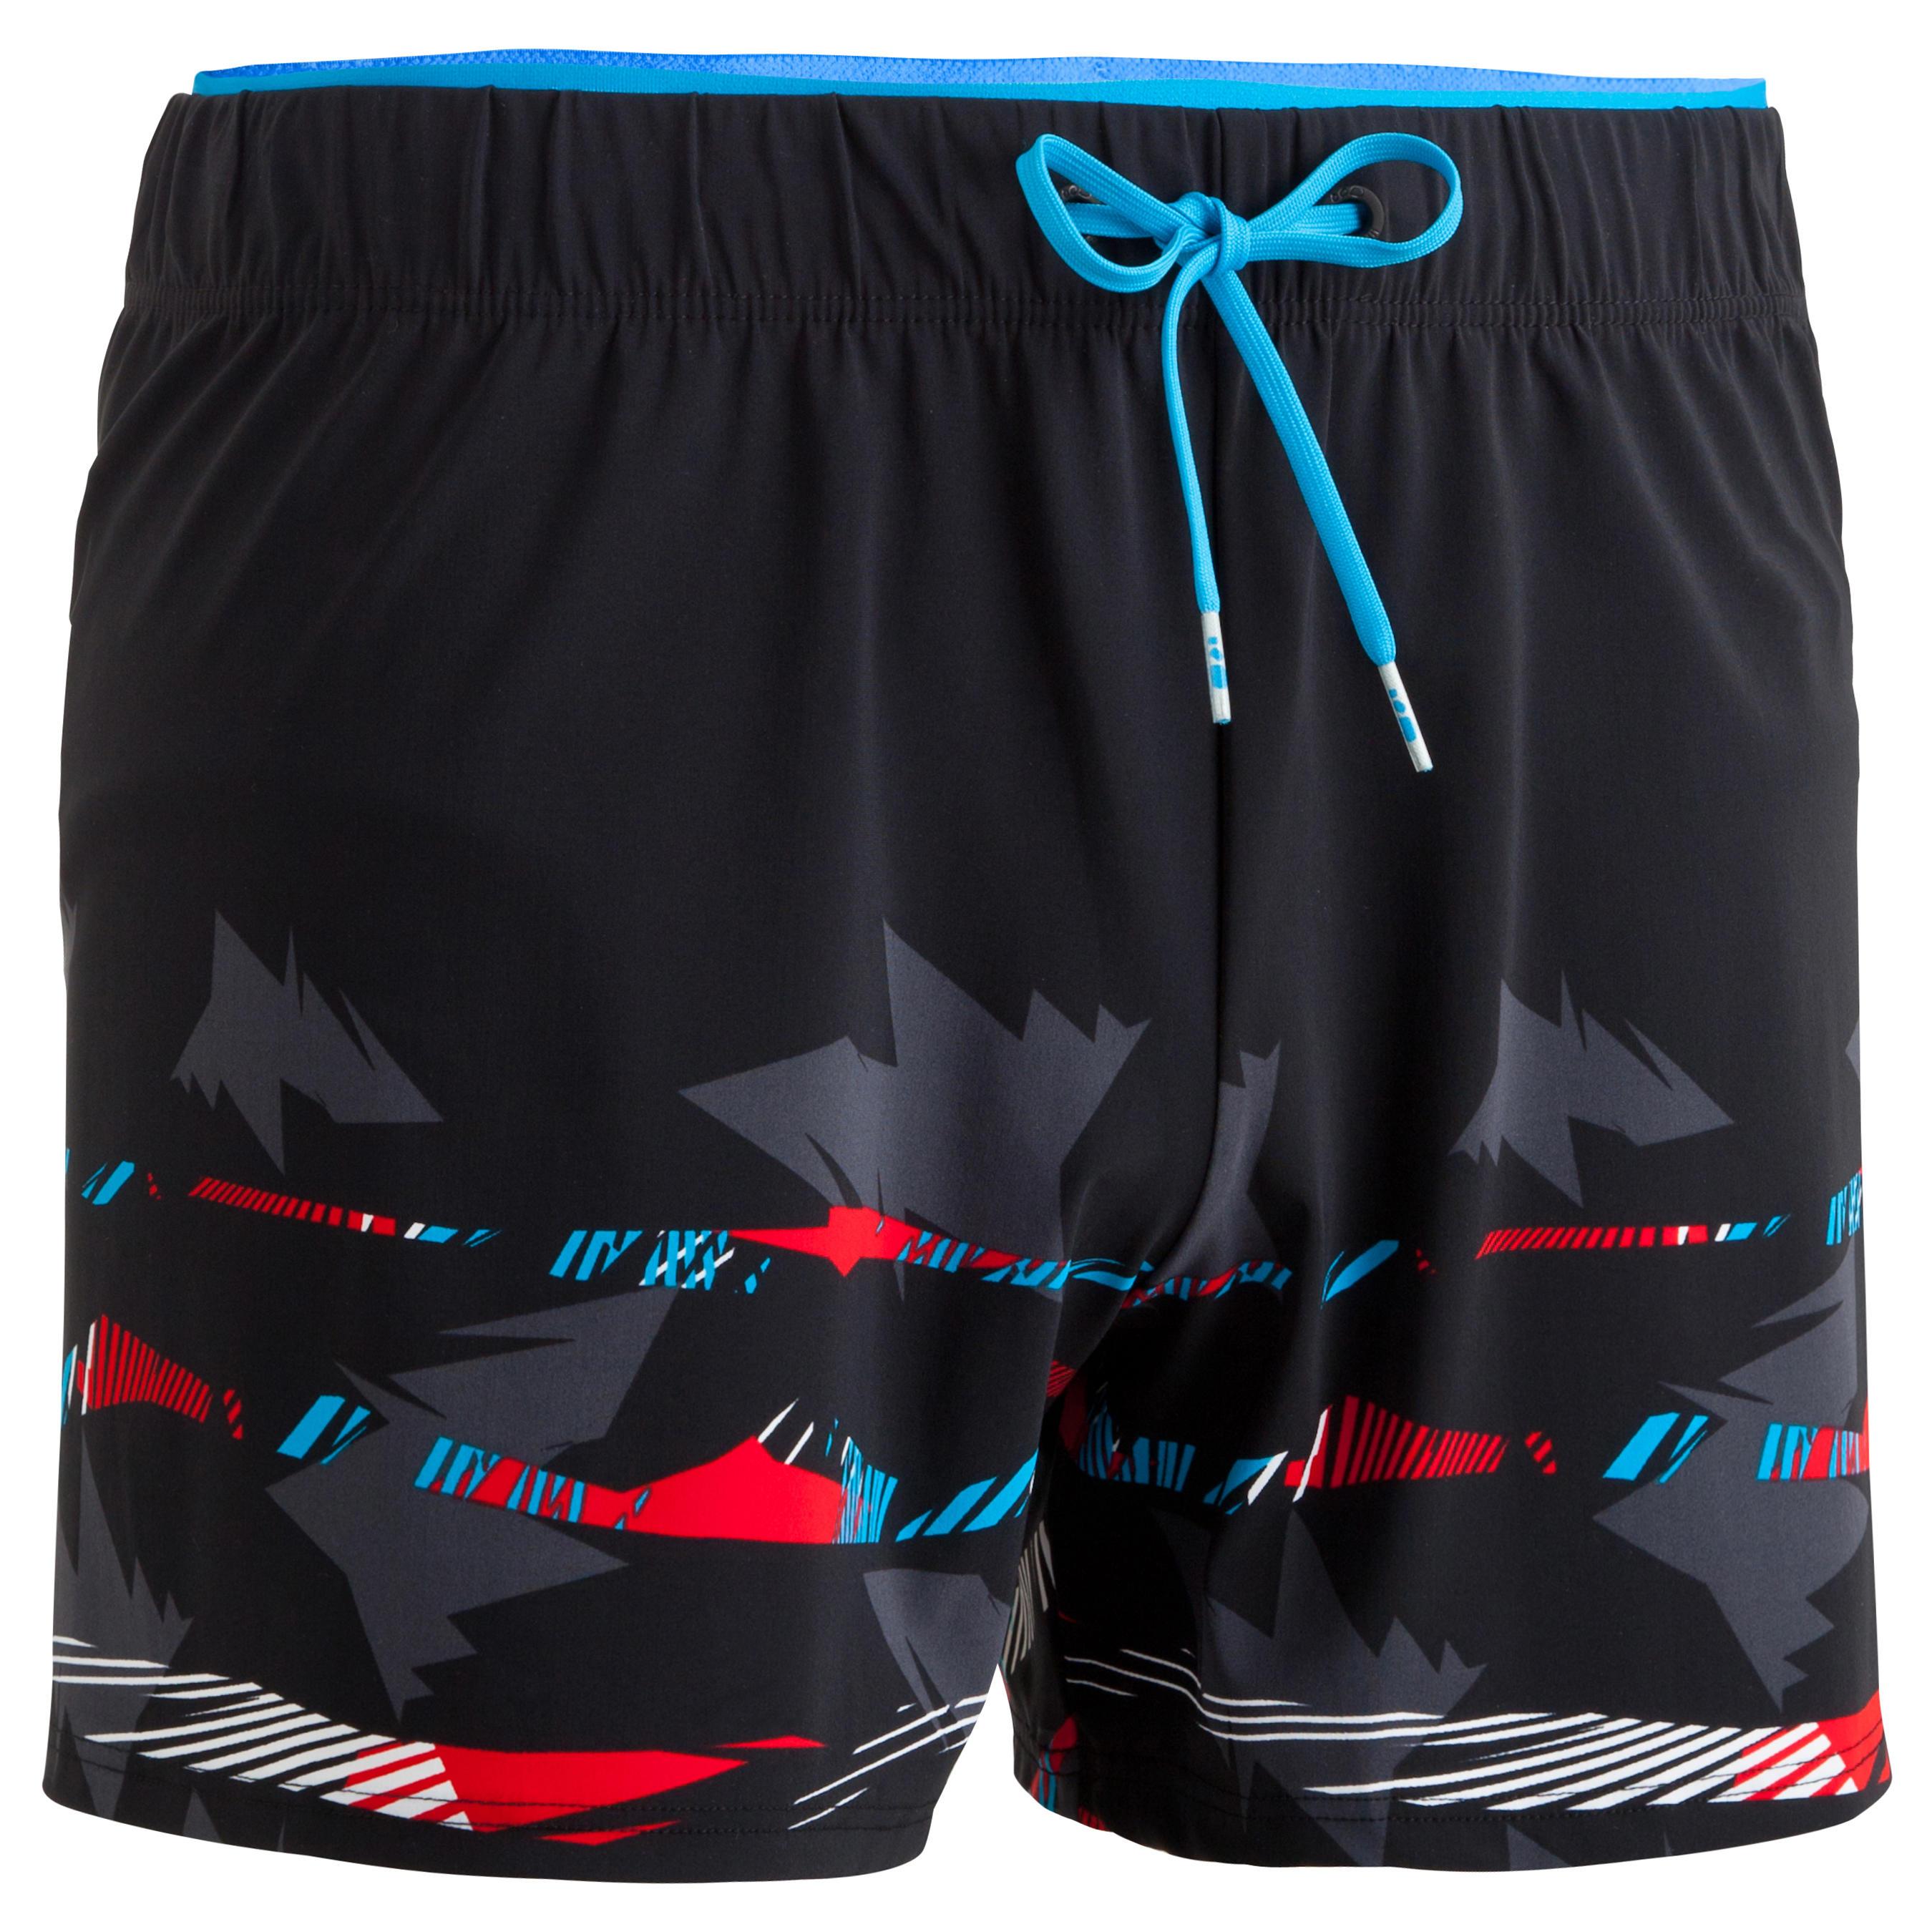 B-Free Men's Swim Shorts -...